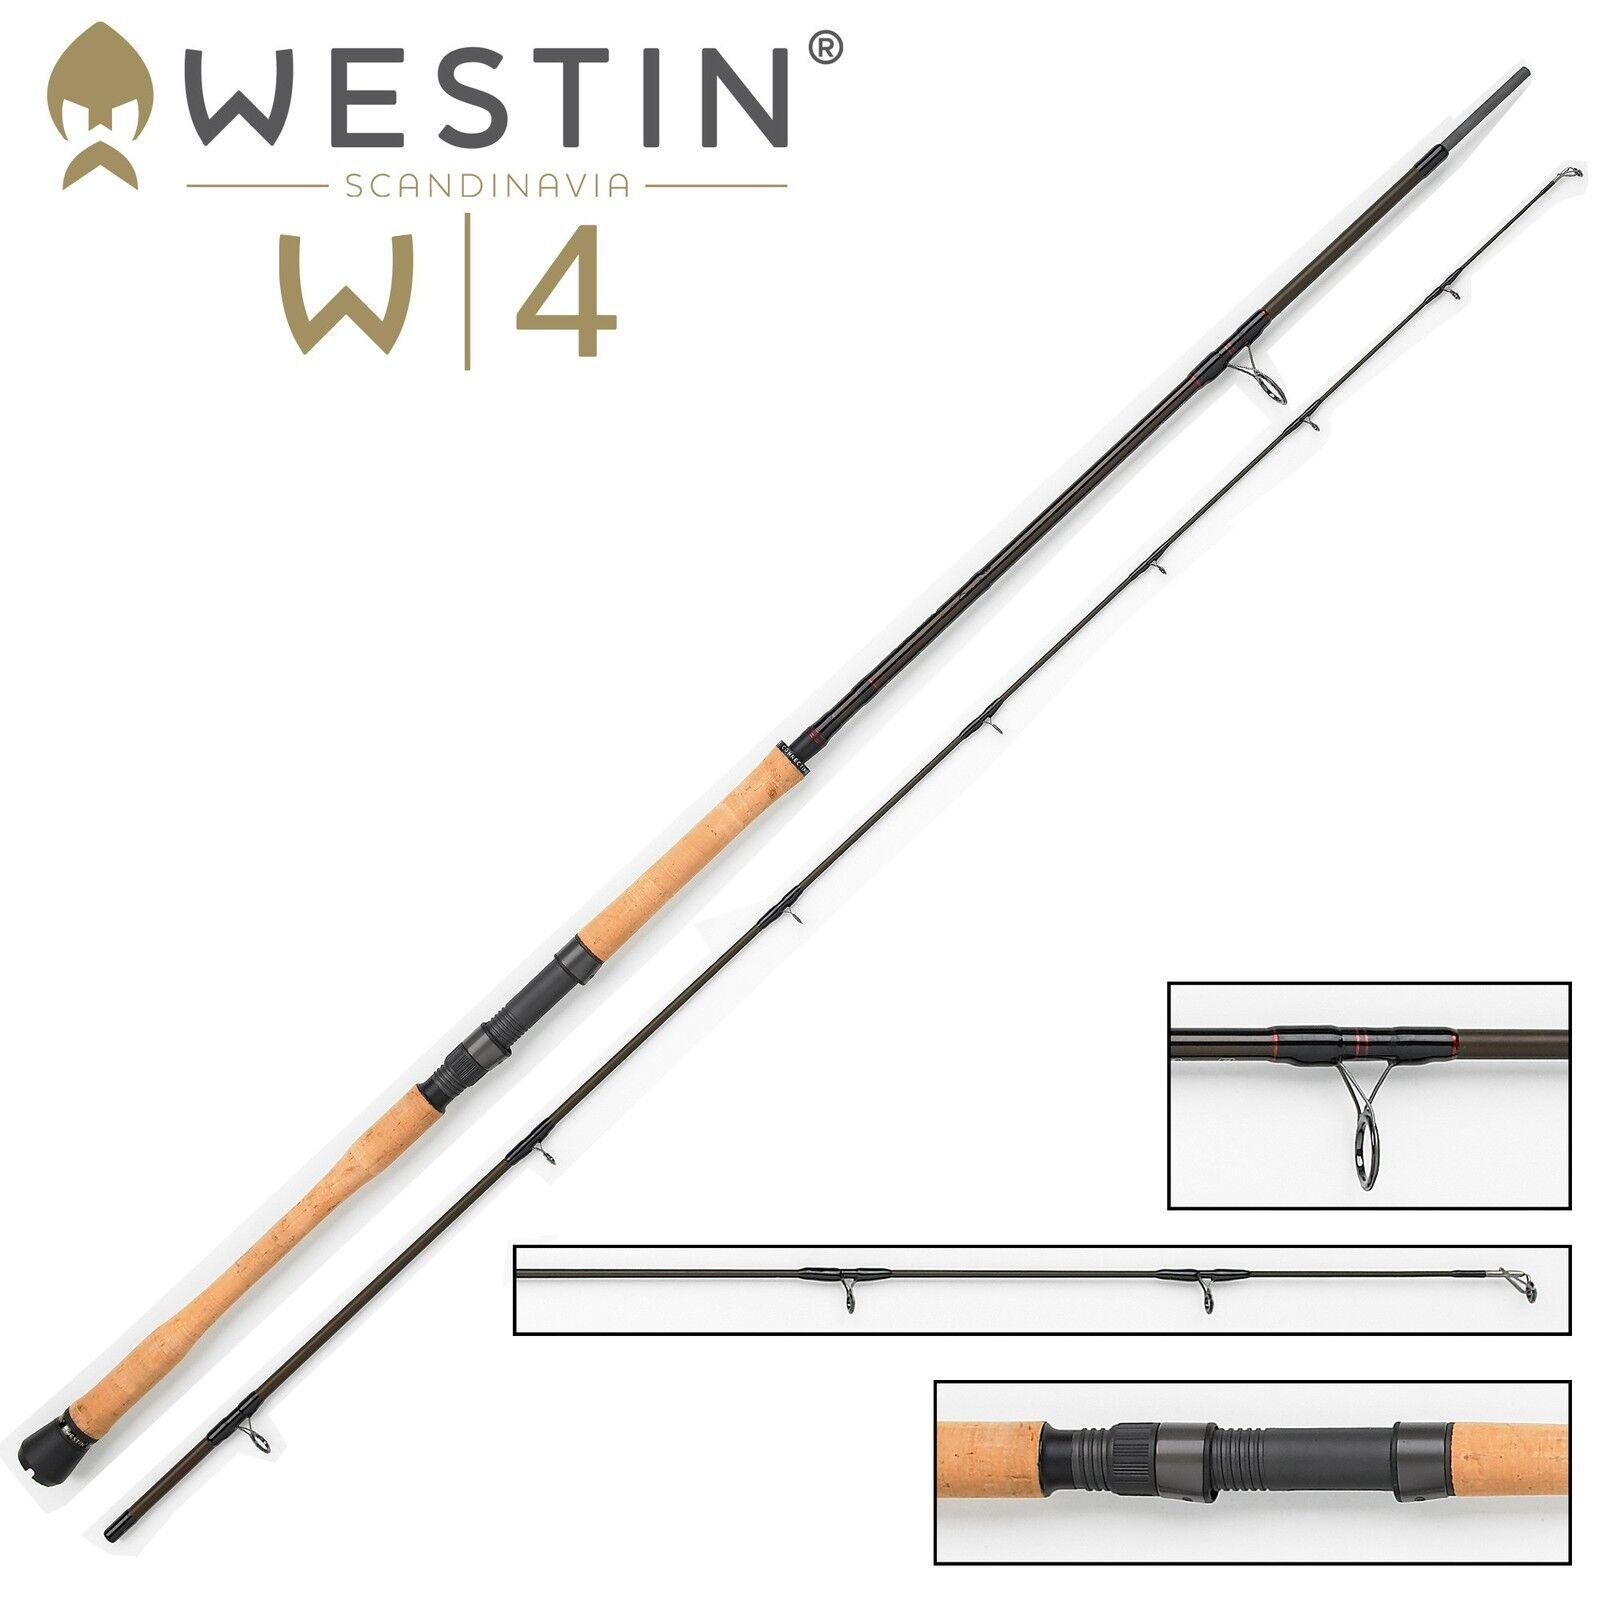 Westin W4 W4 W4 Powercast XH Spinnrute 240cm 60-180g , Hechtrute, Bigbaitrute 798225